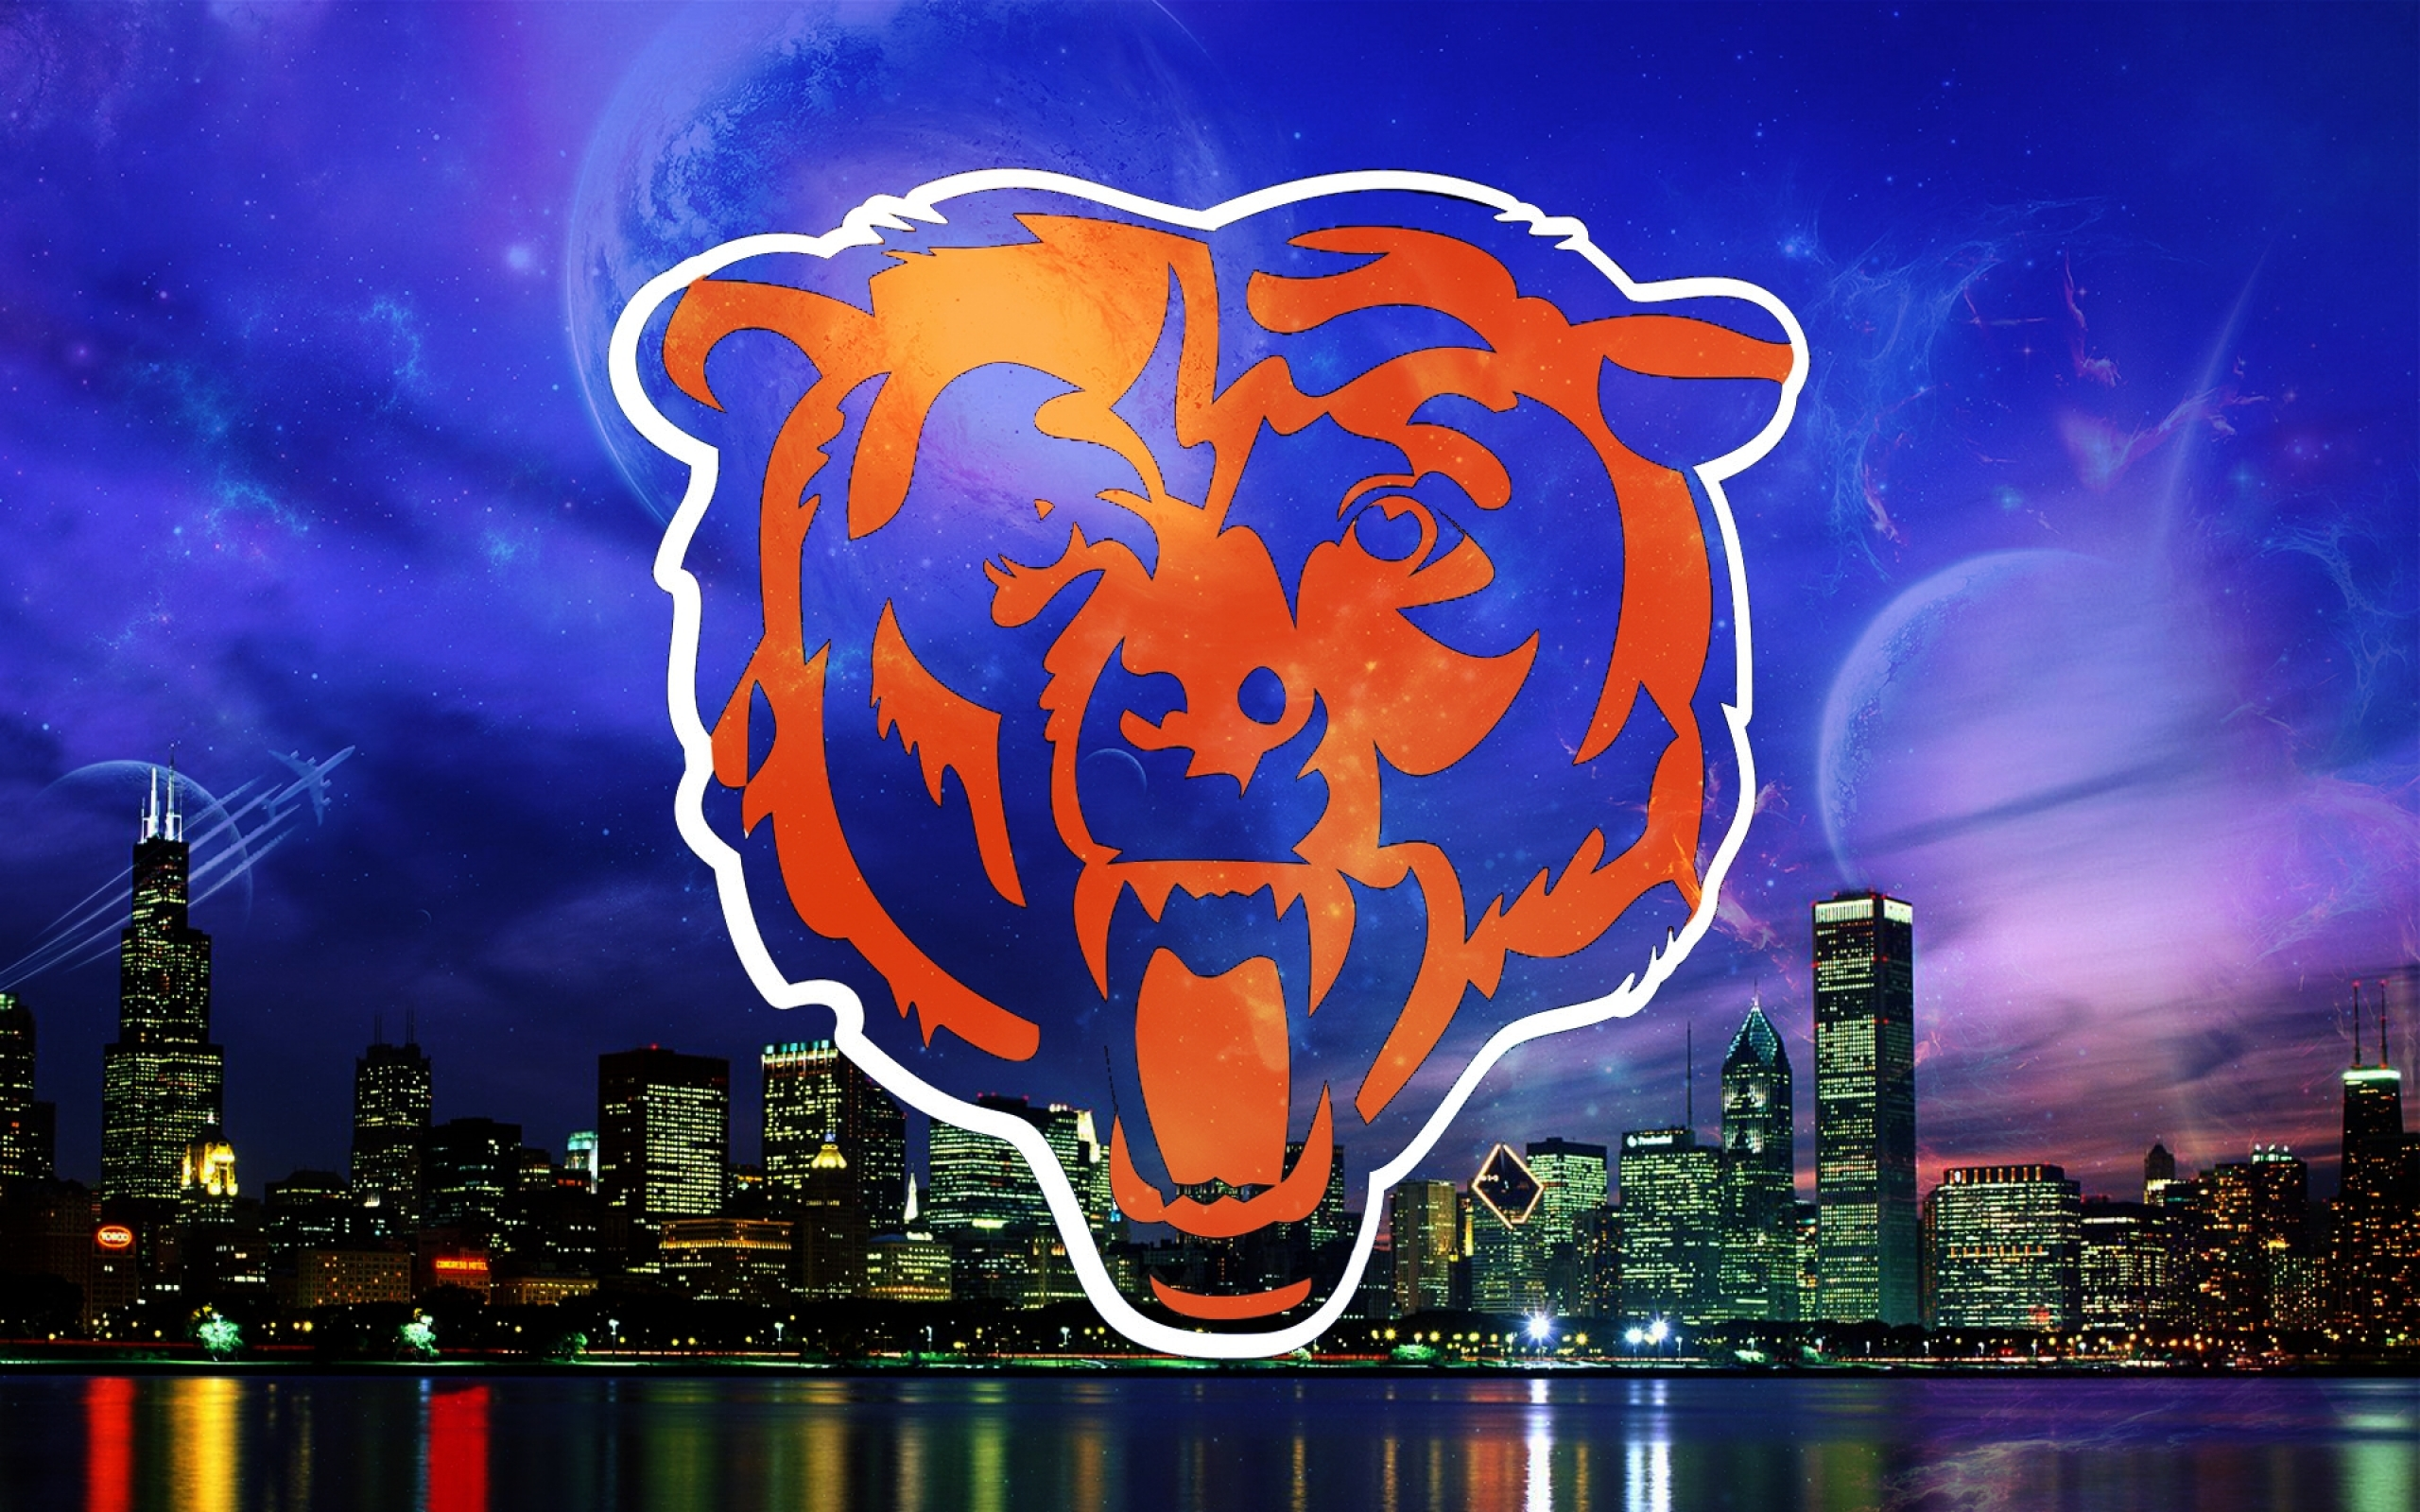 HD Chicago Bears Wallpaper 2560x1600